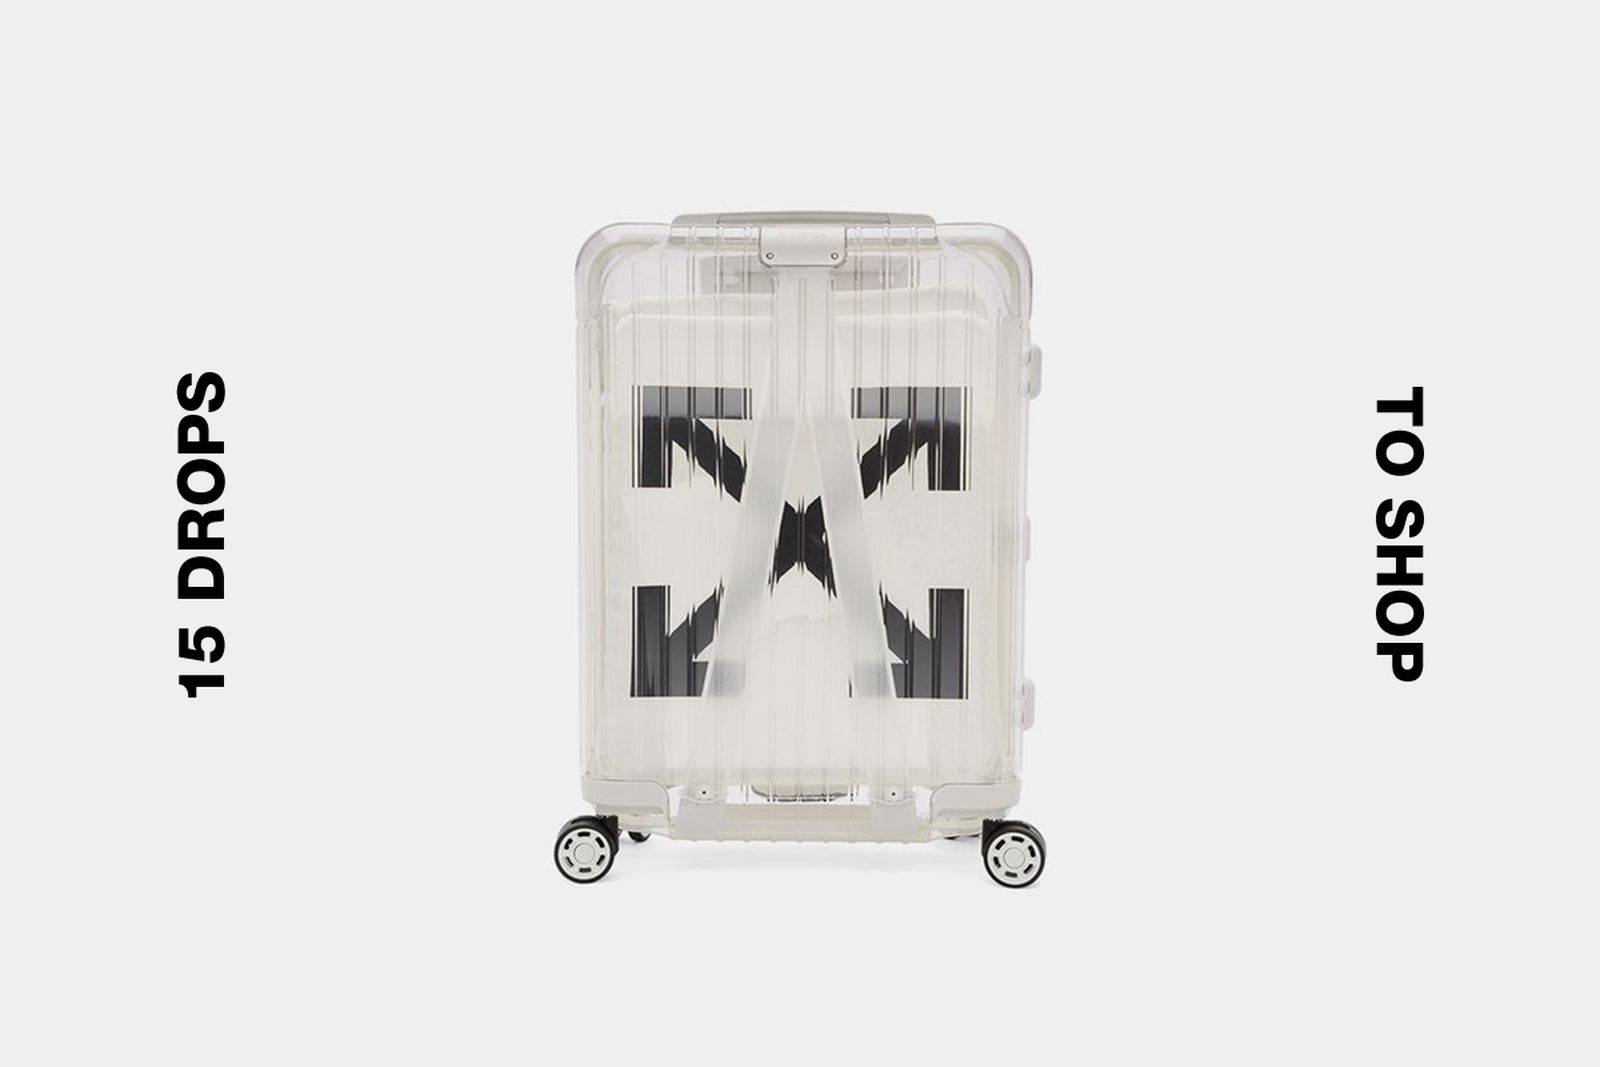 off white rimowa luggage best drops buy 1017 ALYX 9SM Handmade Rust OFF-WHITE c/o Virgil Abloh